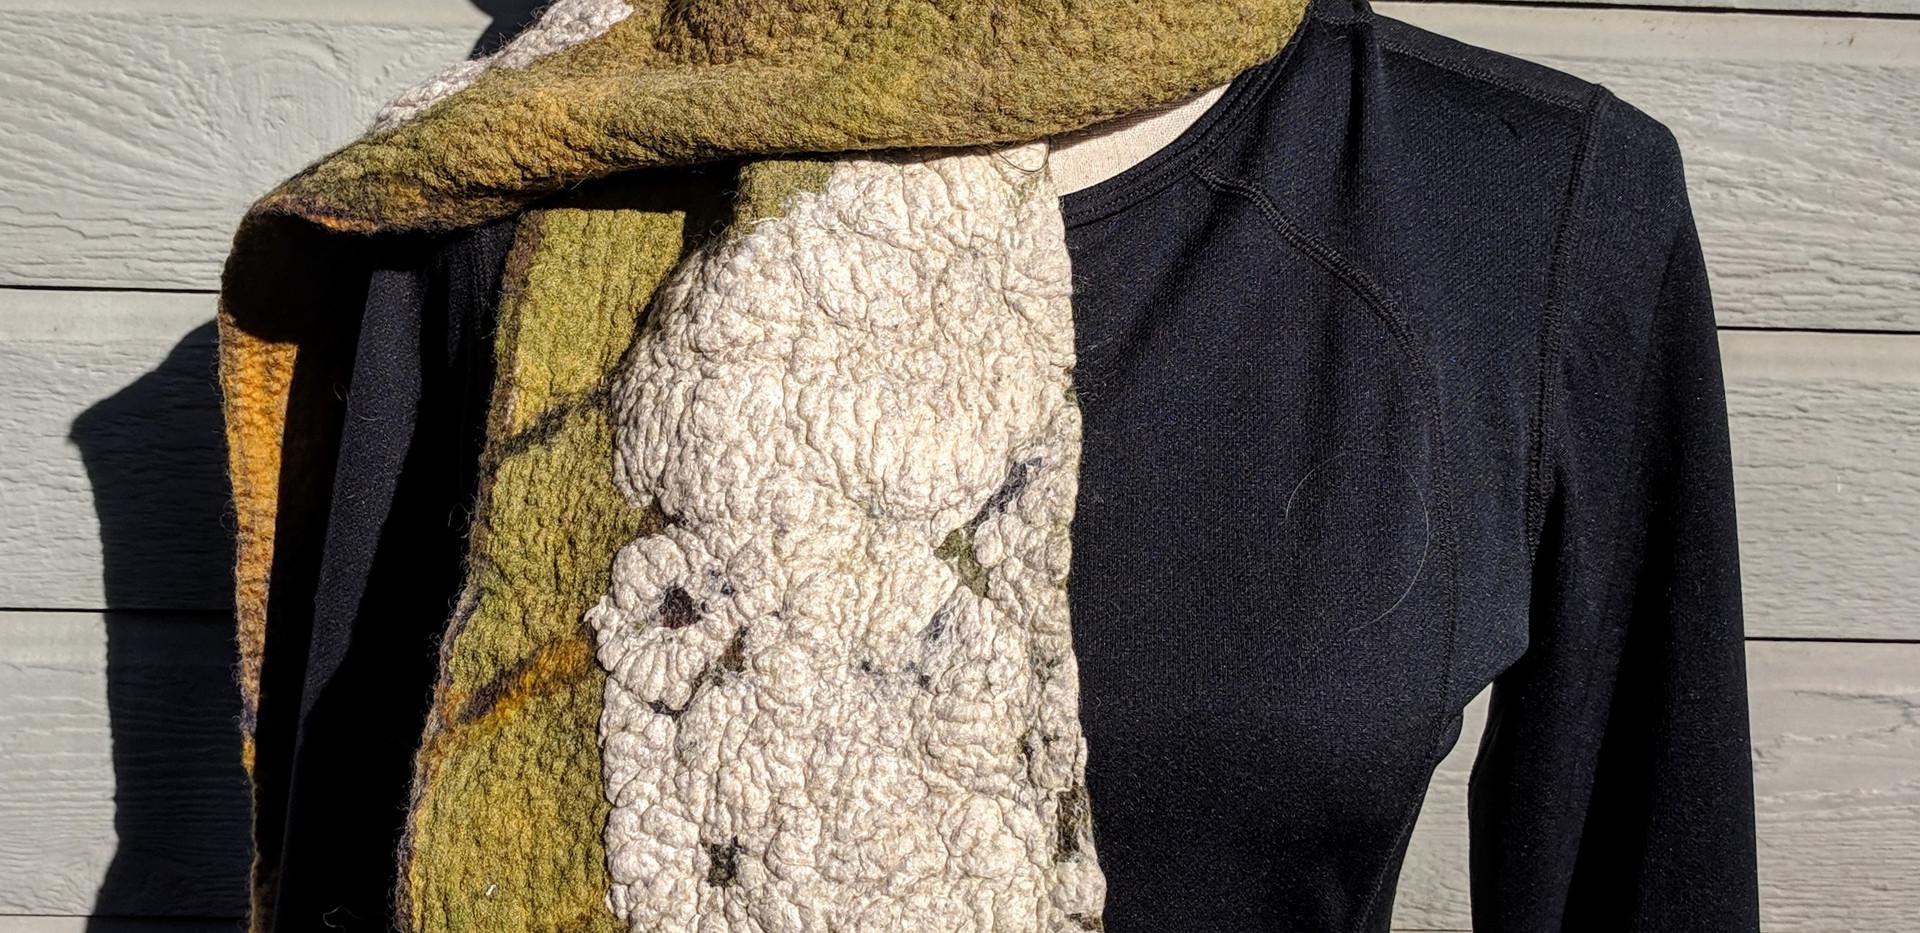 cotton batting scarf.jpg